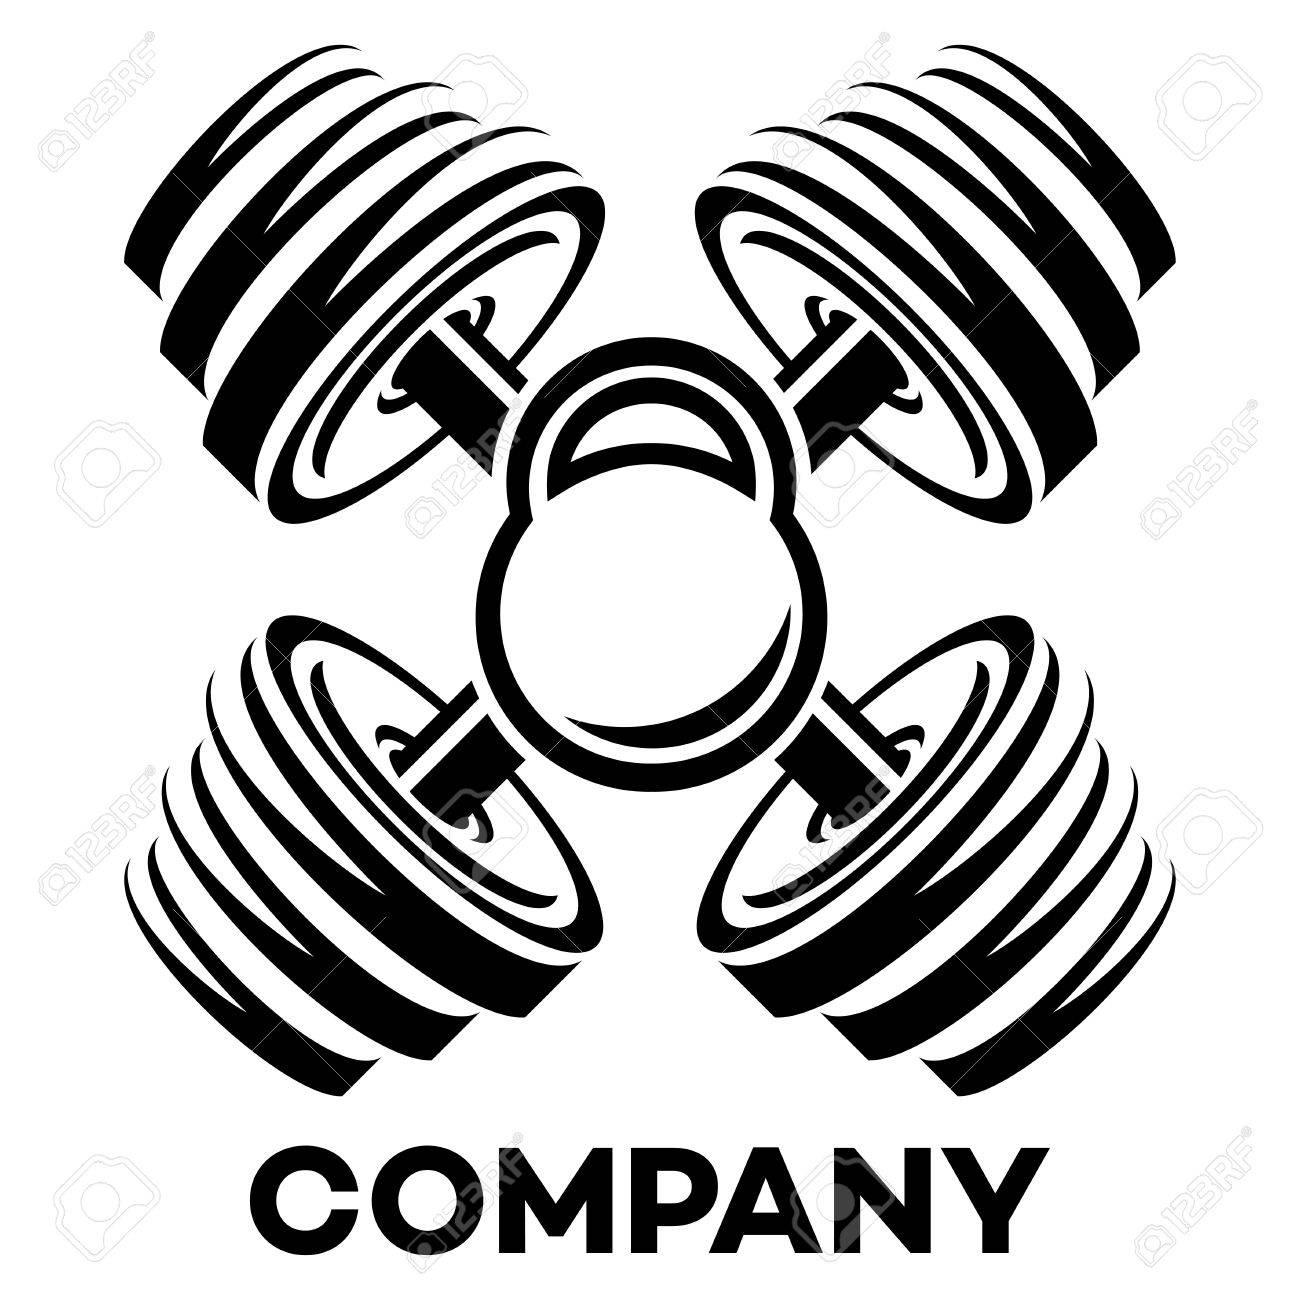 bodybuilding logo royalty free cliparts vectors and stock rh 123rf com bodybuilding logs on pegmgf bodybuilding logos sample